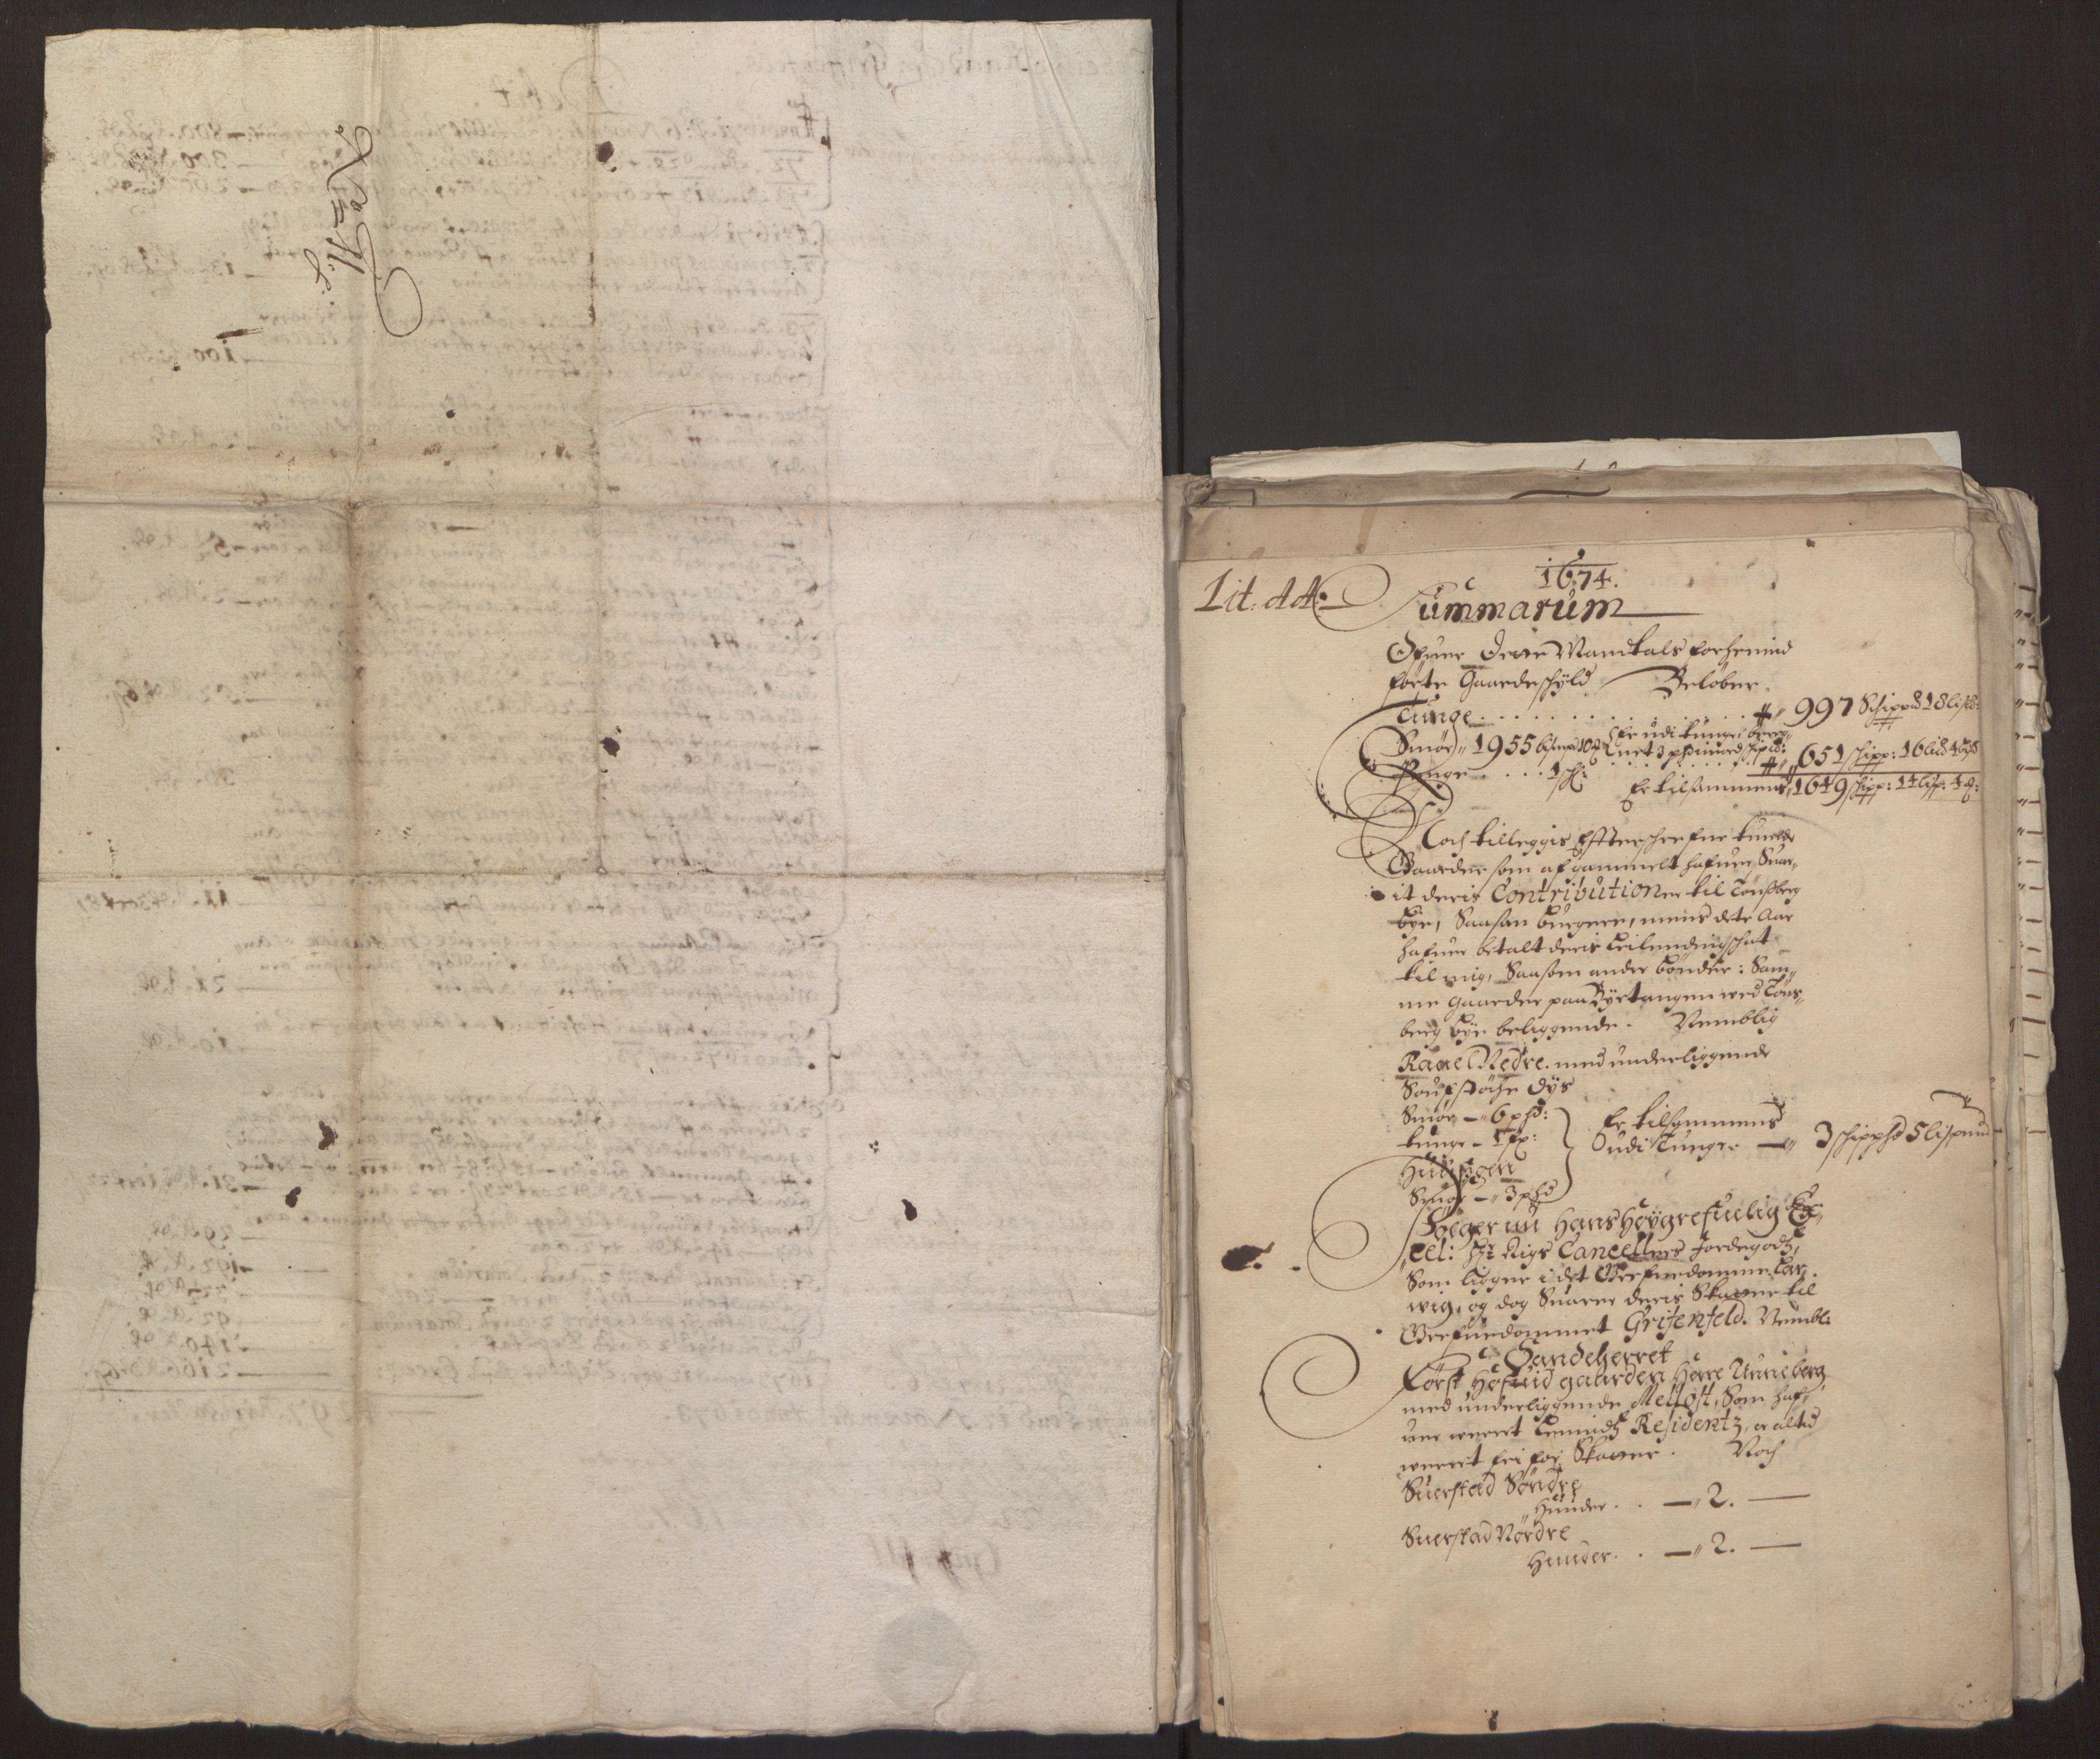 RA, Rentekammeret inntil 1814, Reviderte regnskaper, Fogderegnskap, R32/L1843: Fogderegnskap Jarlsberg grevskap, 1674-1675, s. 37